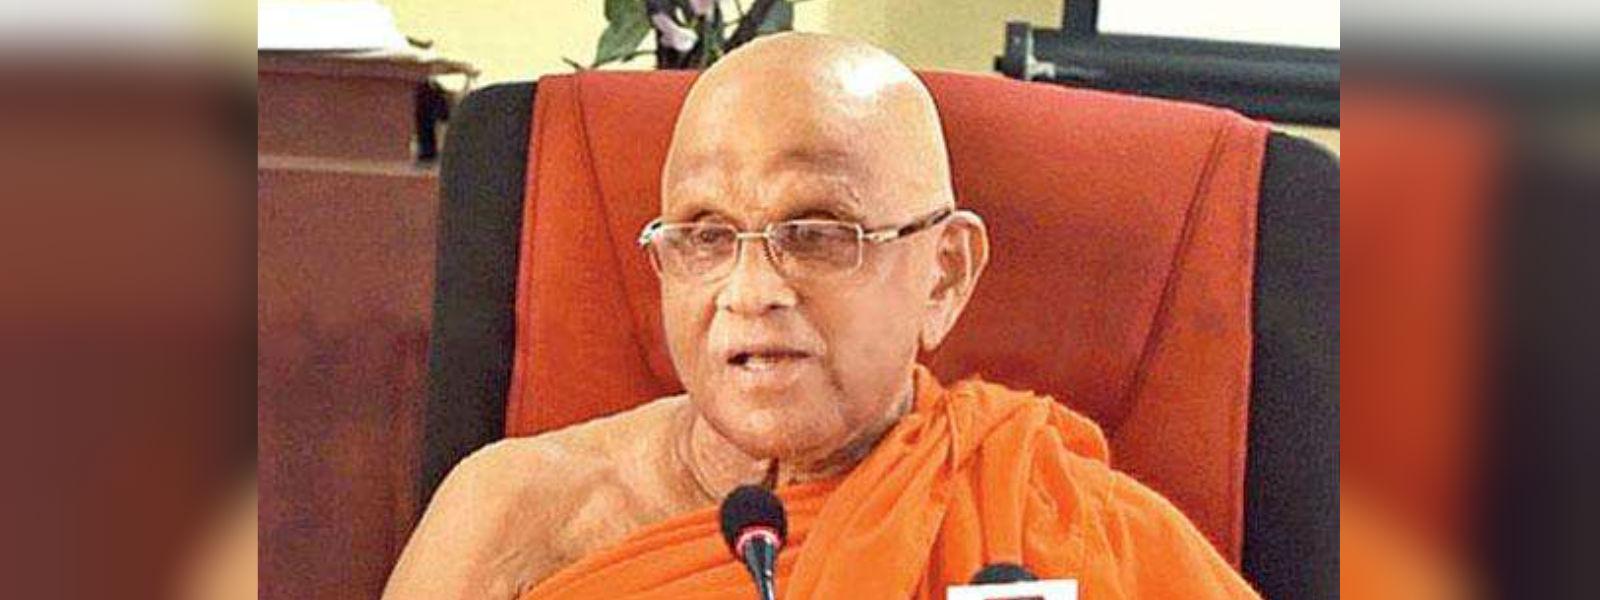 Administer second dose of jab: Muruththettuwe Ananda Thero